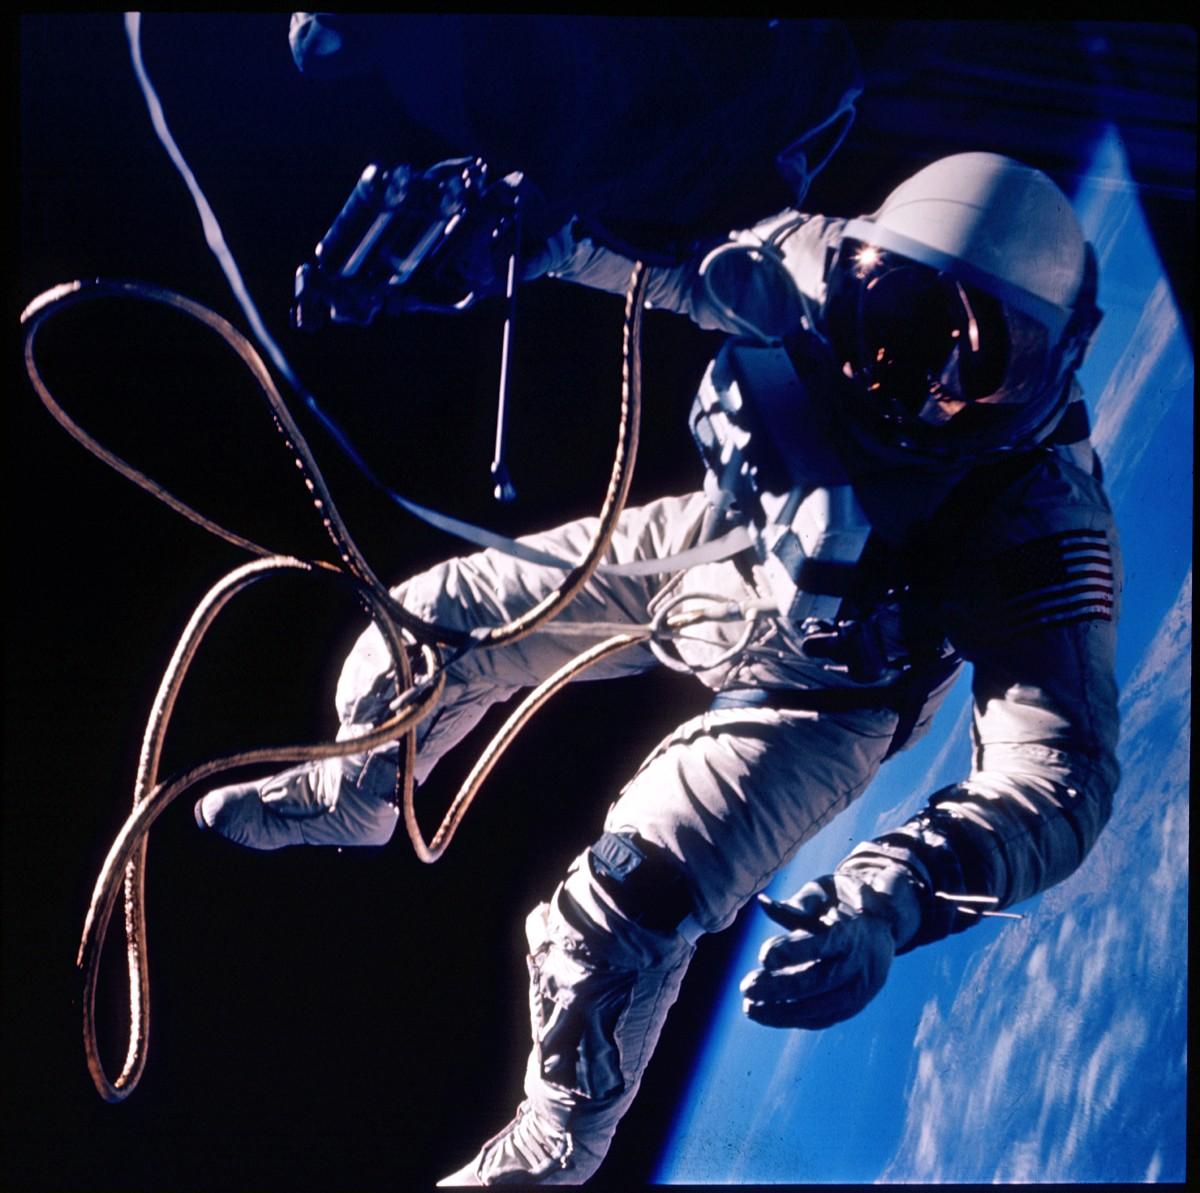 soviet space program ed white - photo #24